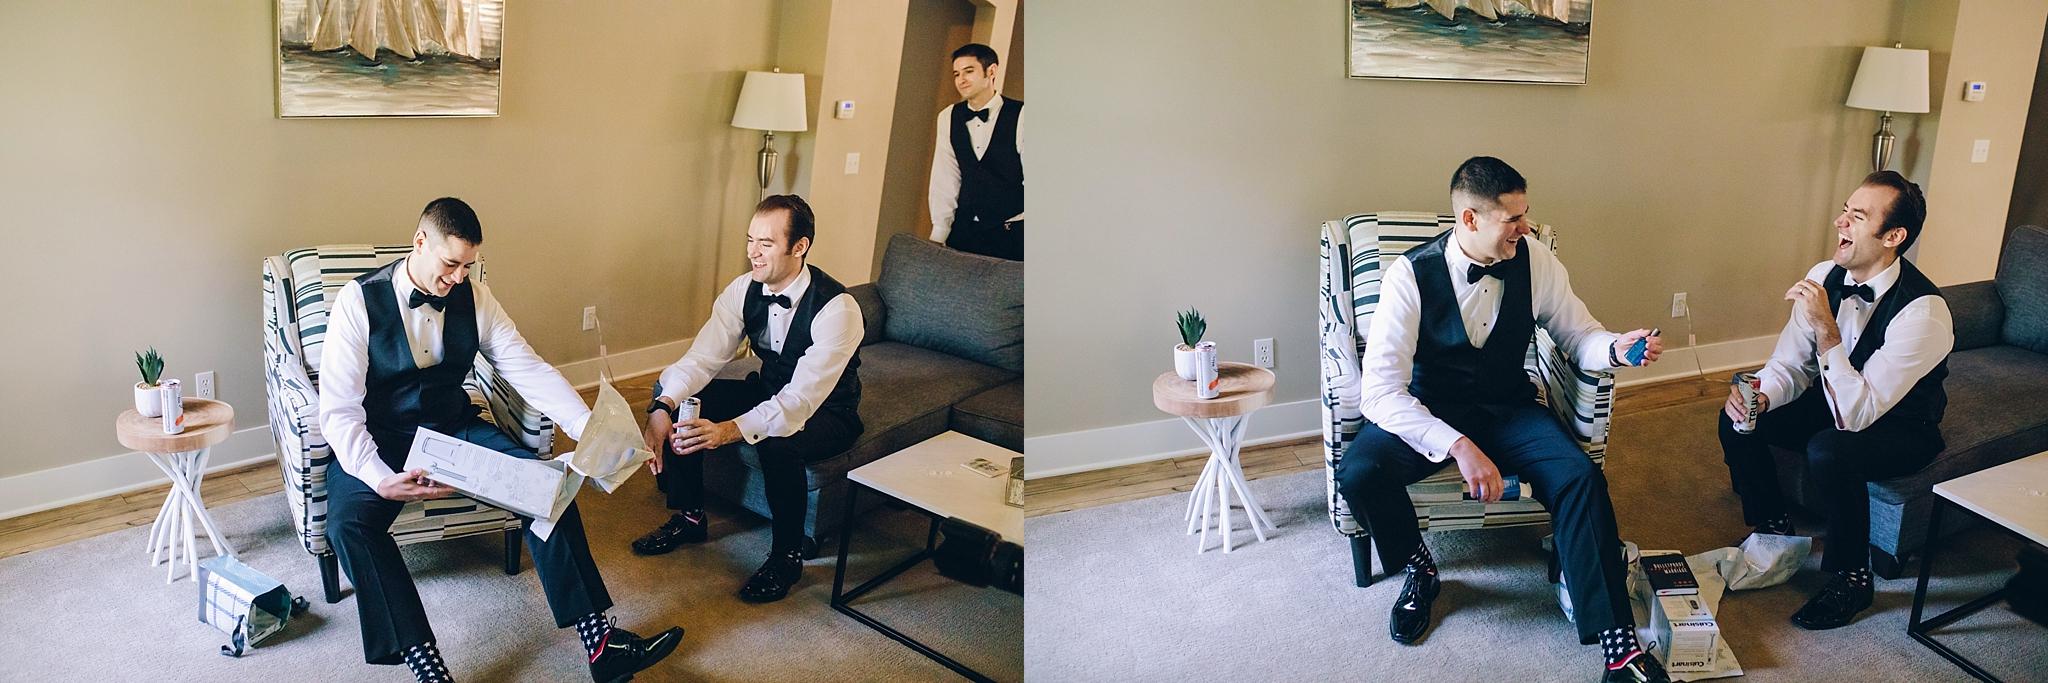 baker-lofts-holland-michigan-wedding-photographer_0321.jpg